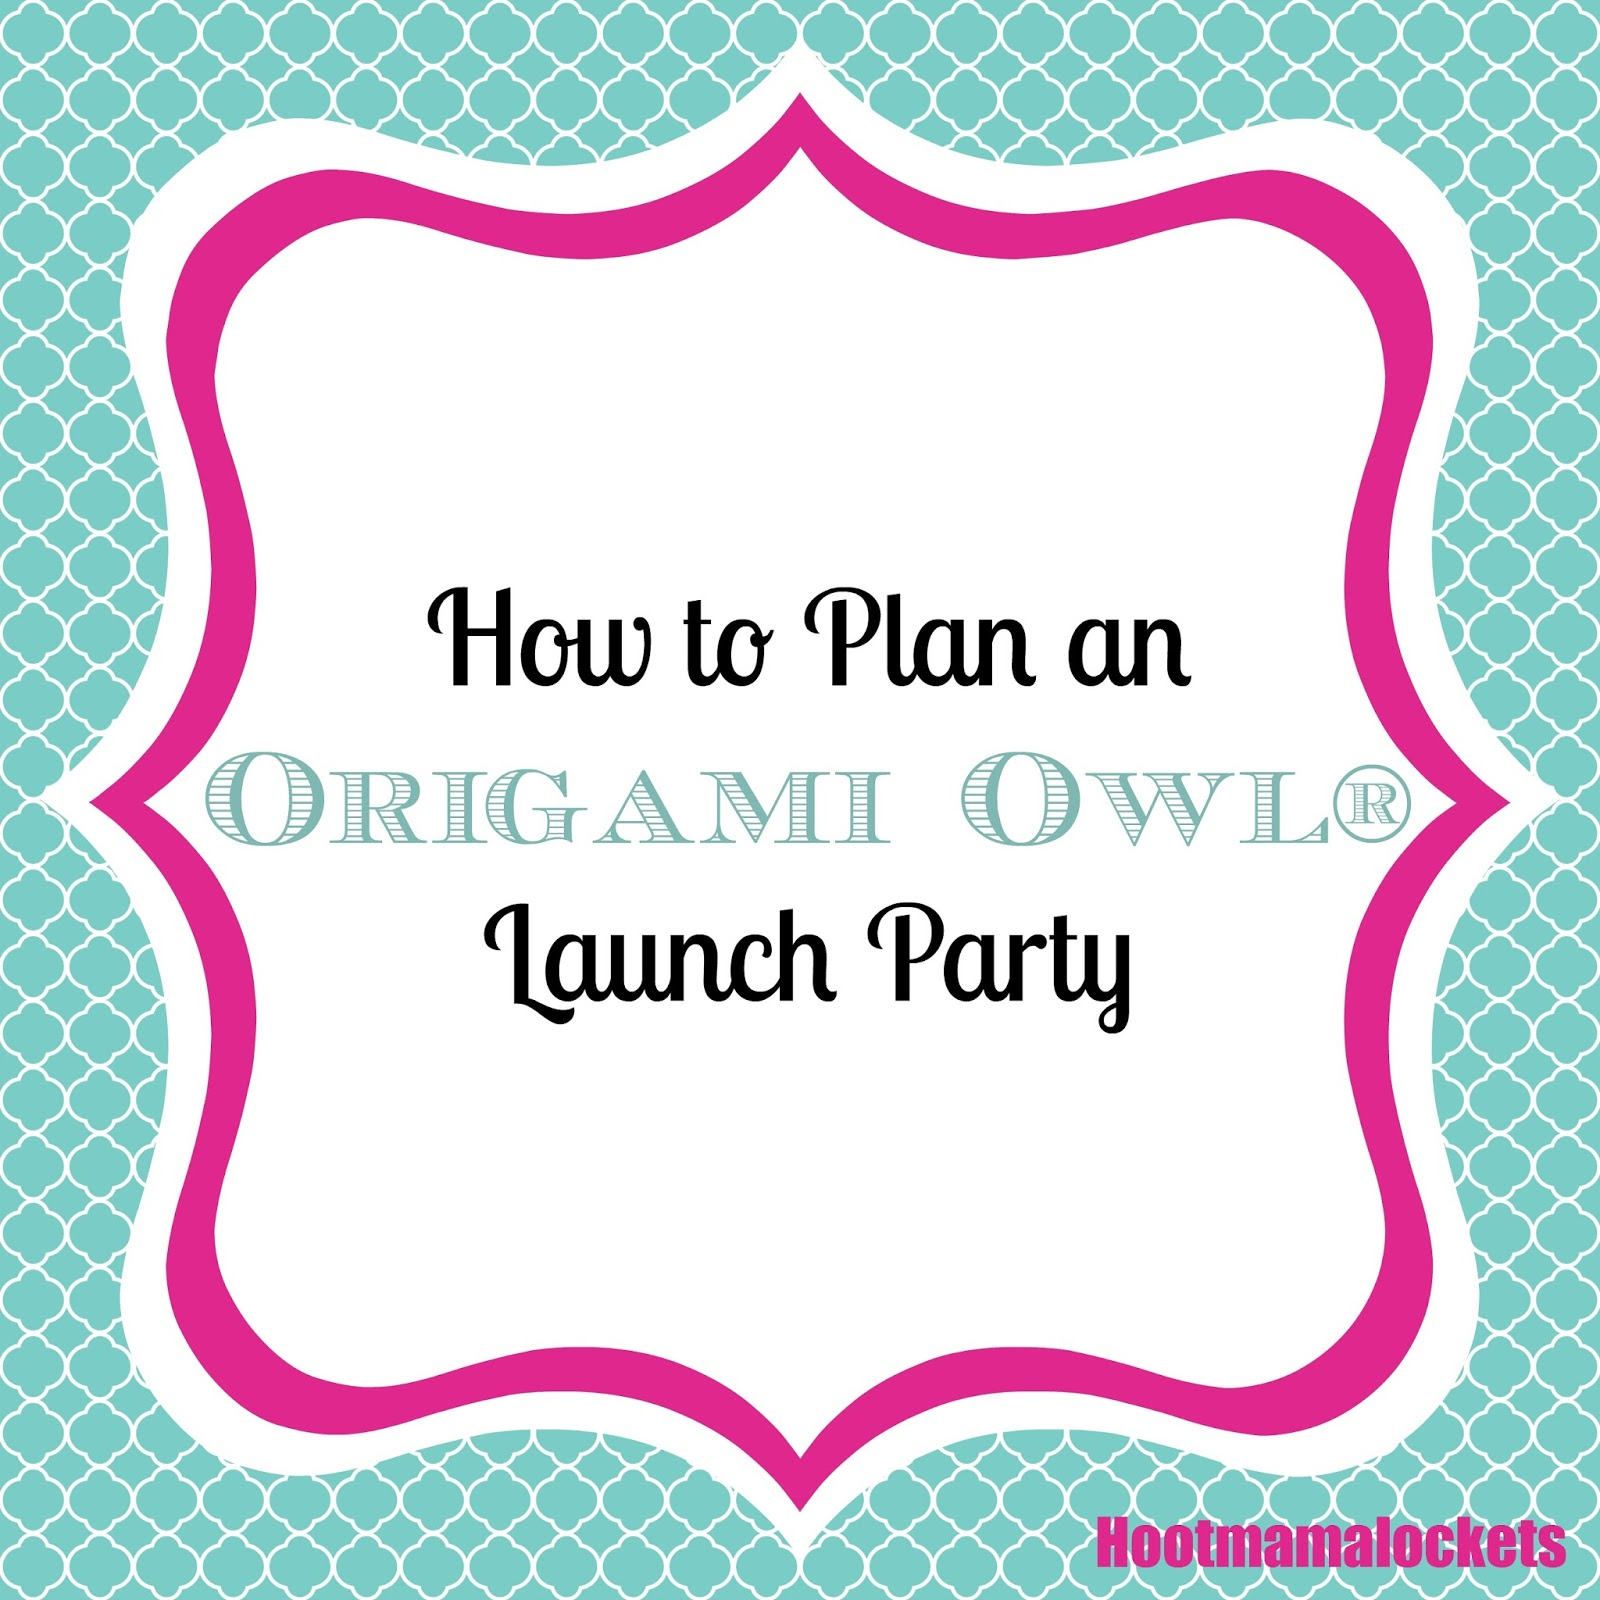 Origami Owl Party Ideas | Party Invitations Ideas - photo#47